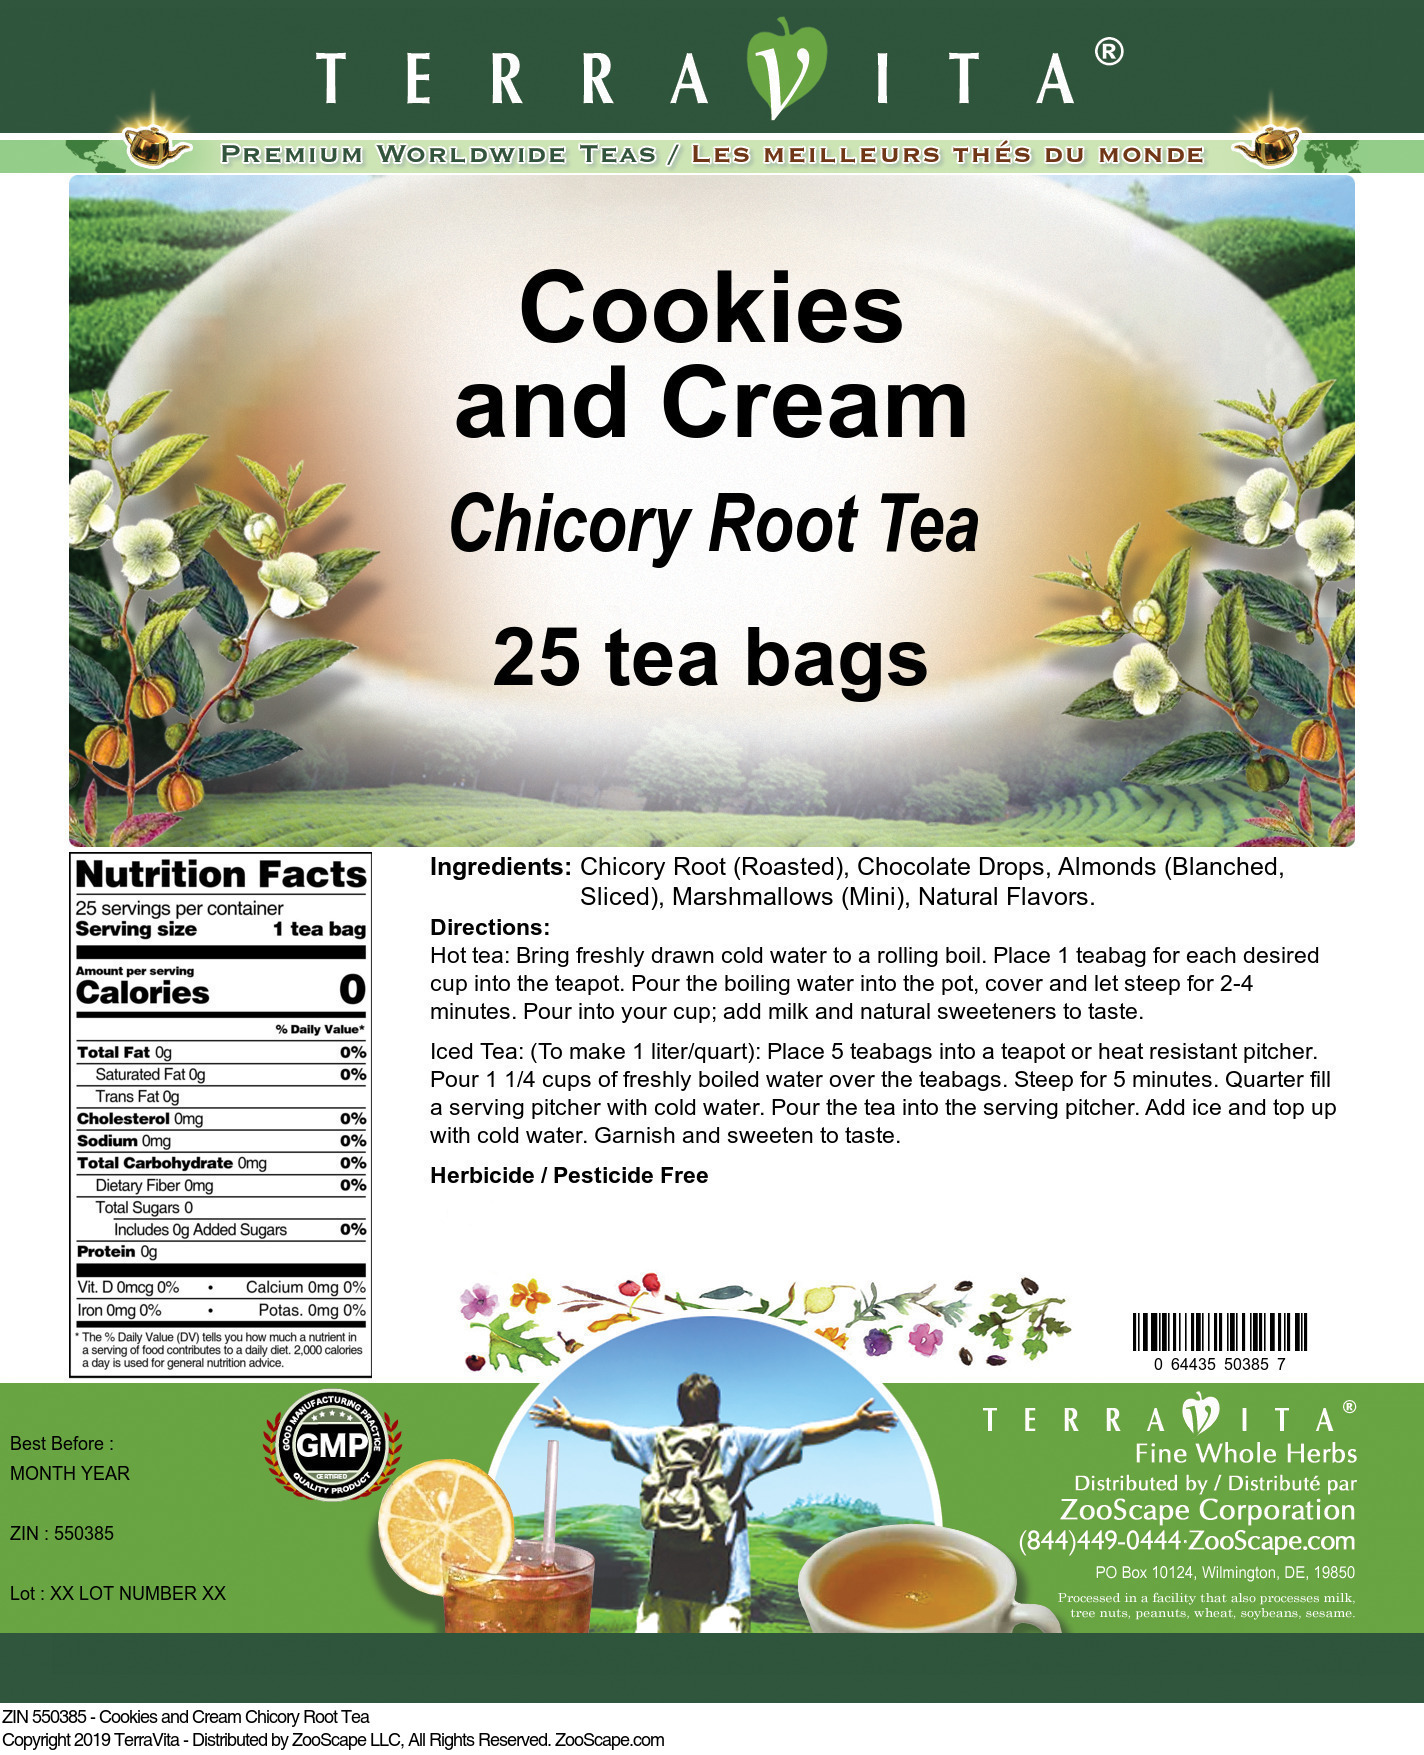 Cookies and Cream Chicory Root Tea